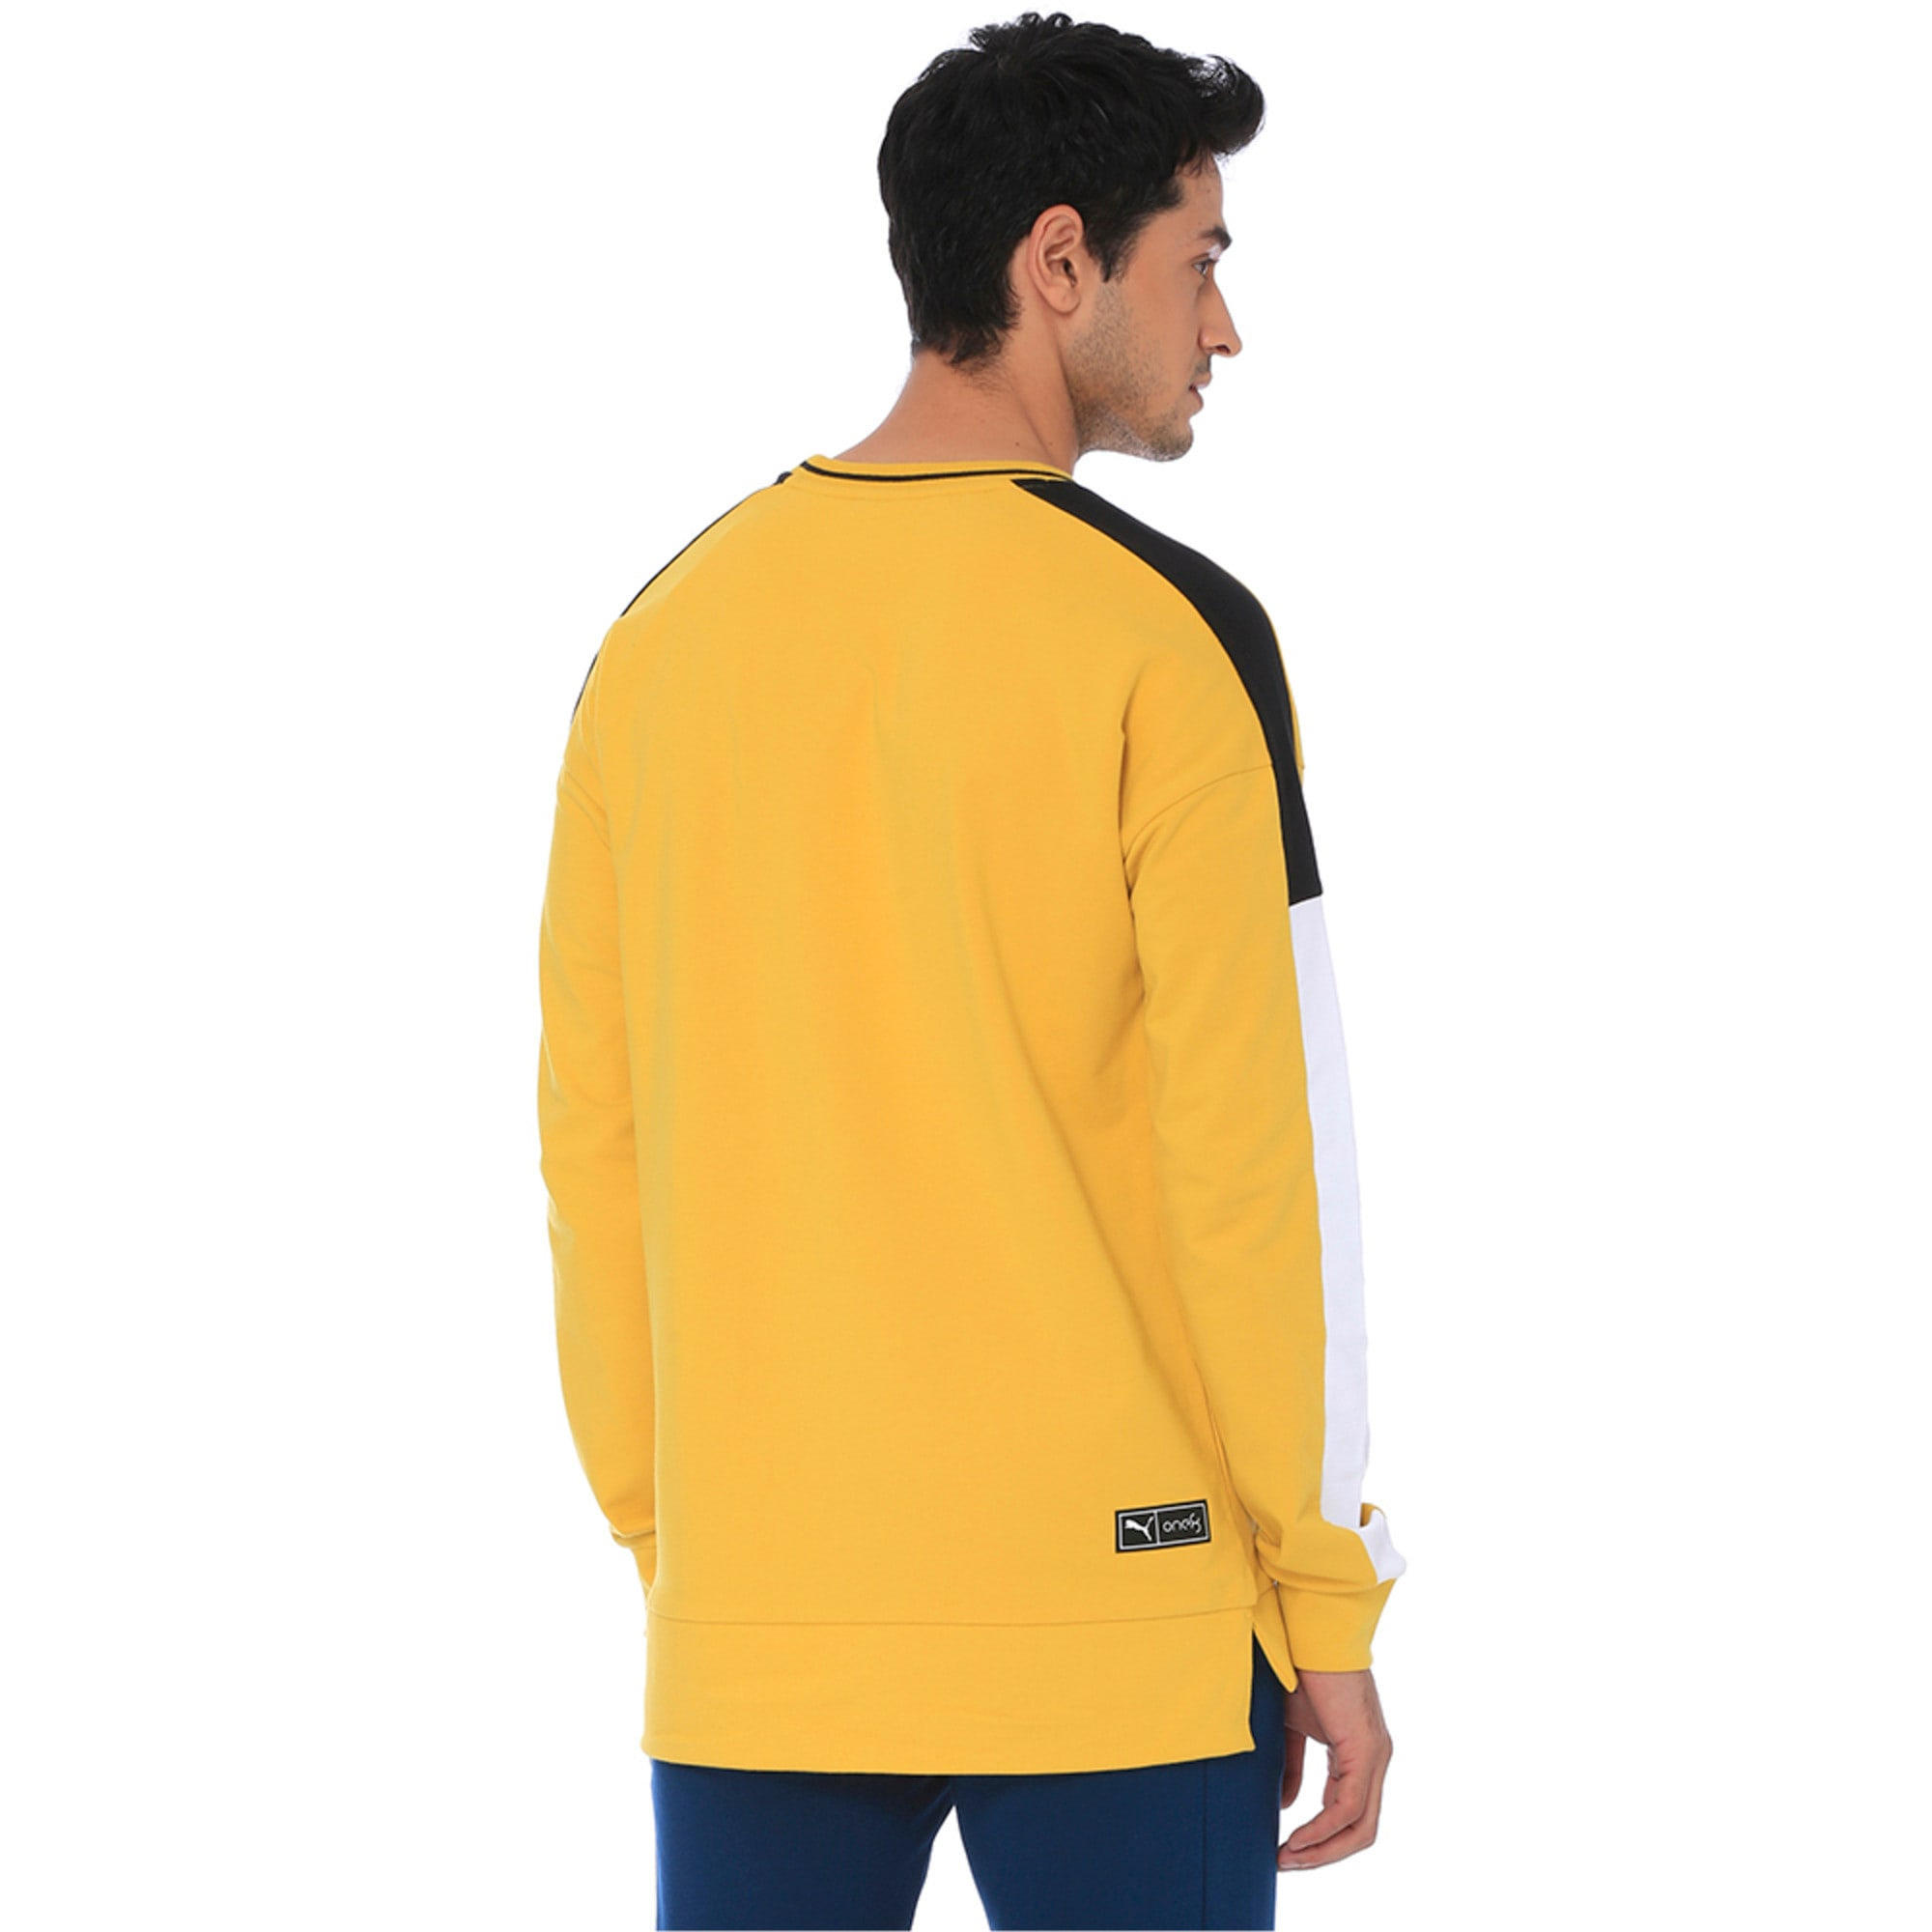 Thumbnail 5 of one8 Men's Crew Sweatshirt, Sulphur, medium-IND